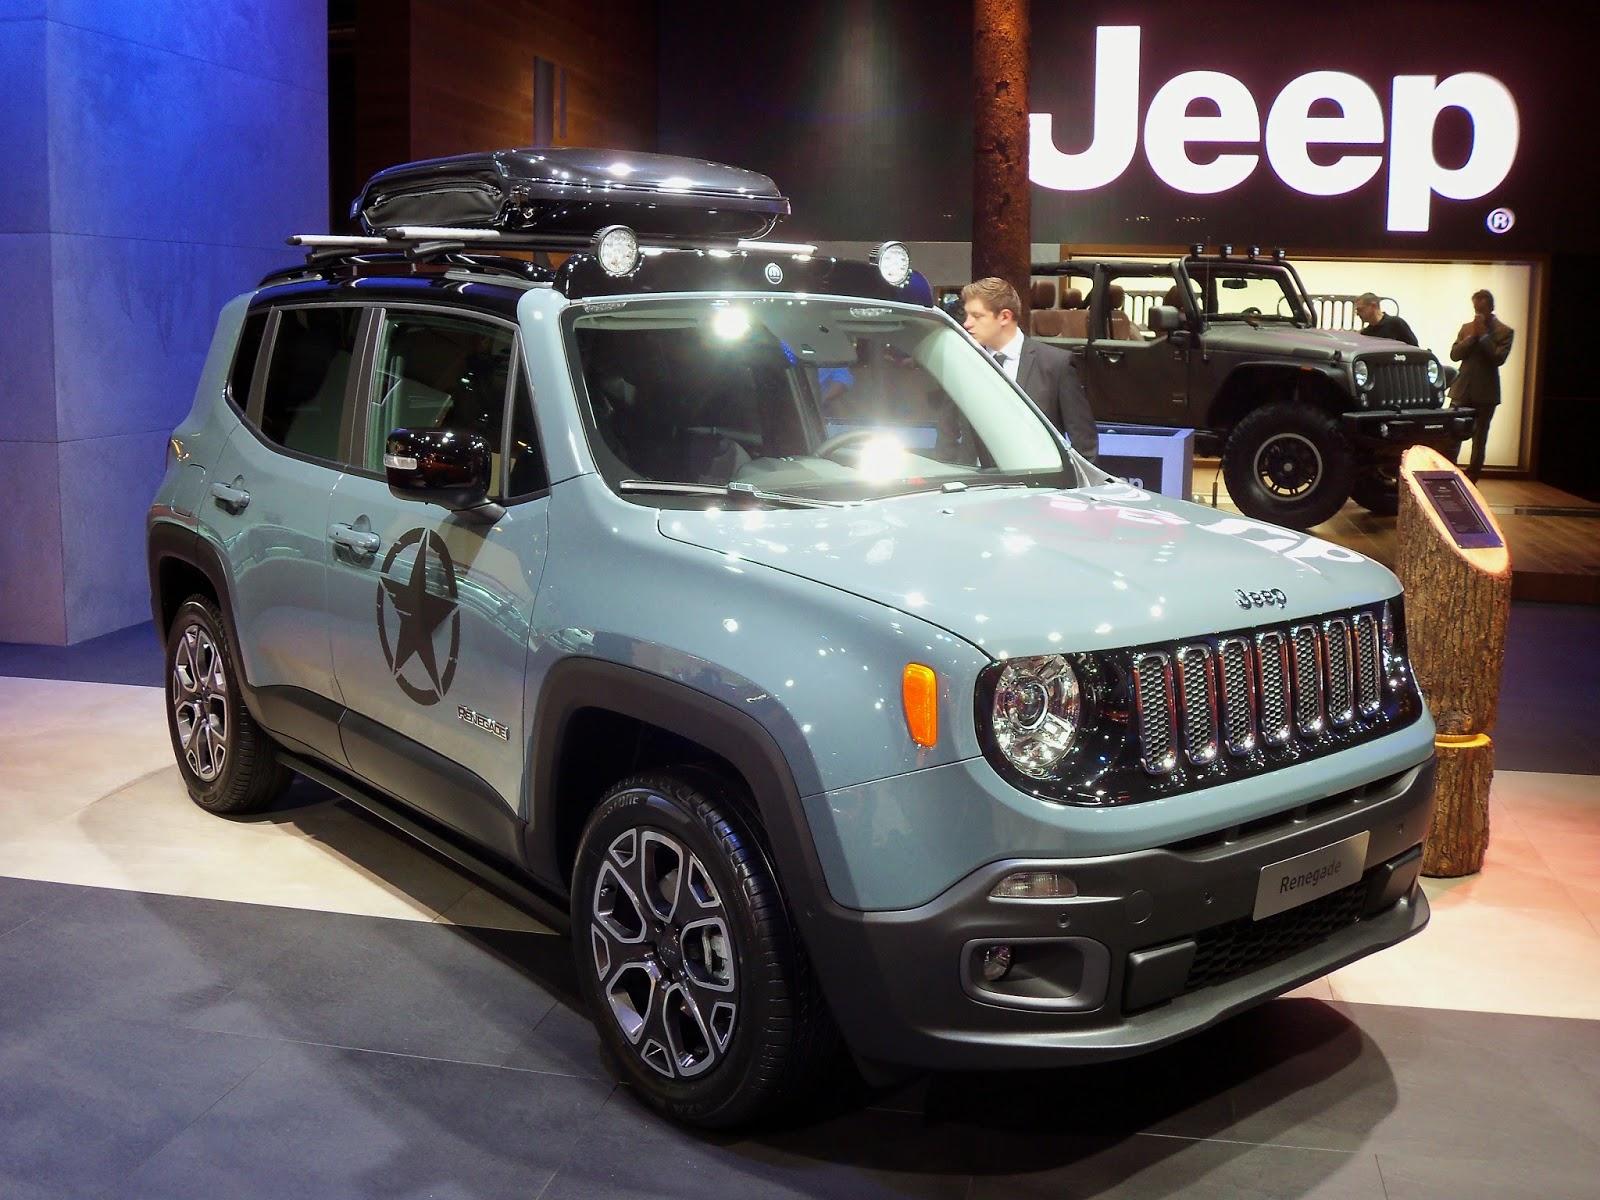 sal243n del par237s jeep � motorsports